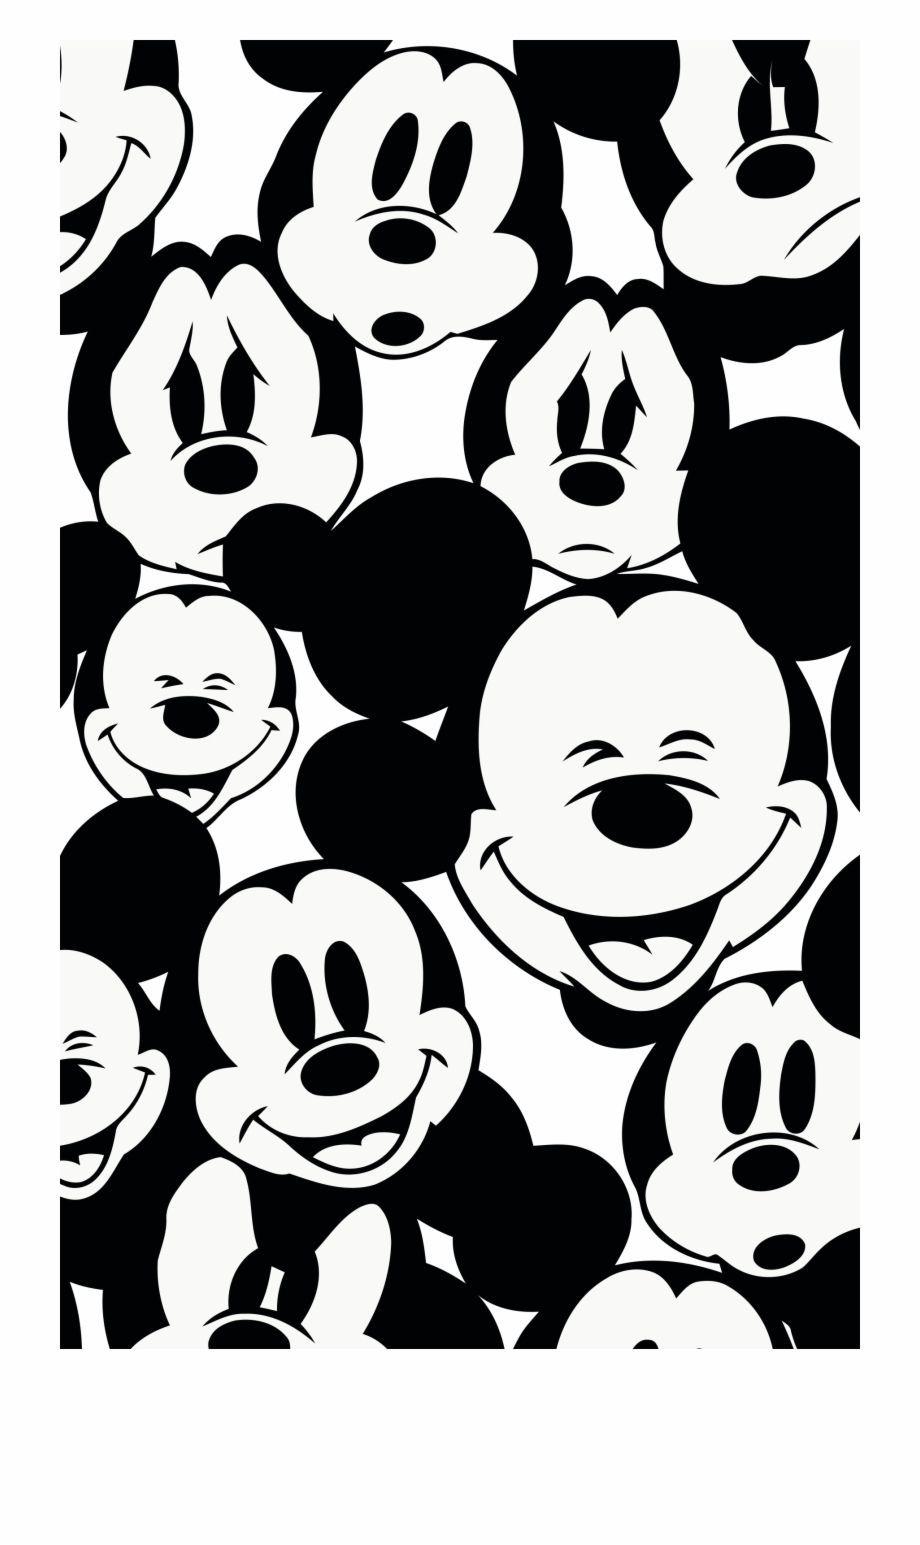 Frank Miller Wallpaper Black And White Cartoon Cartoon Wallpaper Cute Cartoon Wallpapers